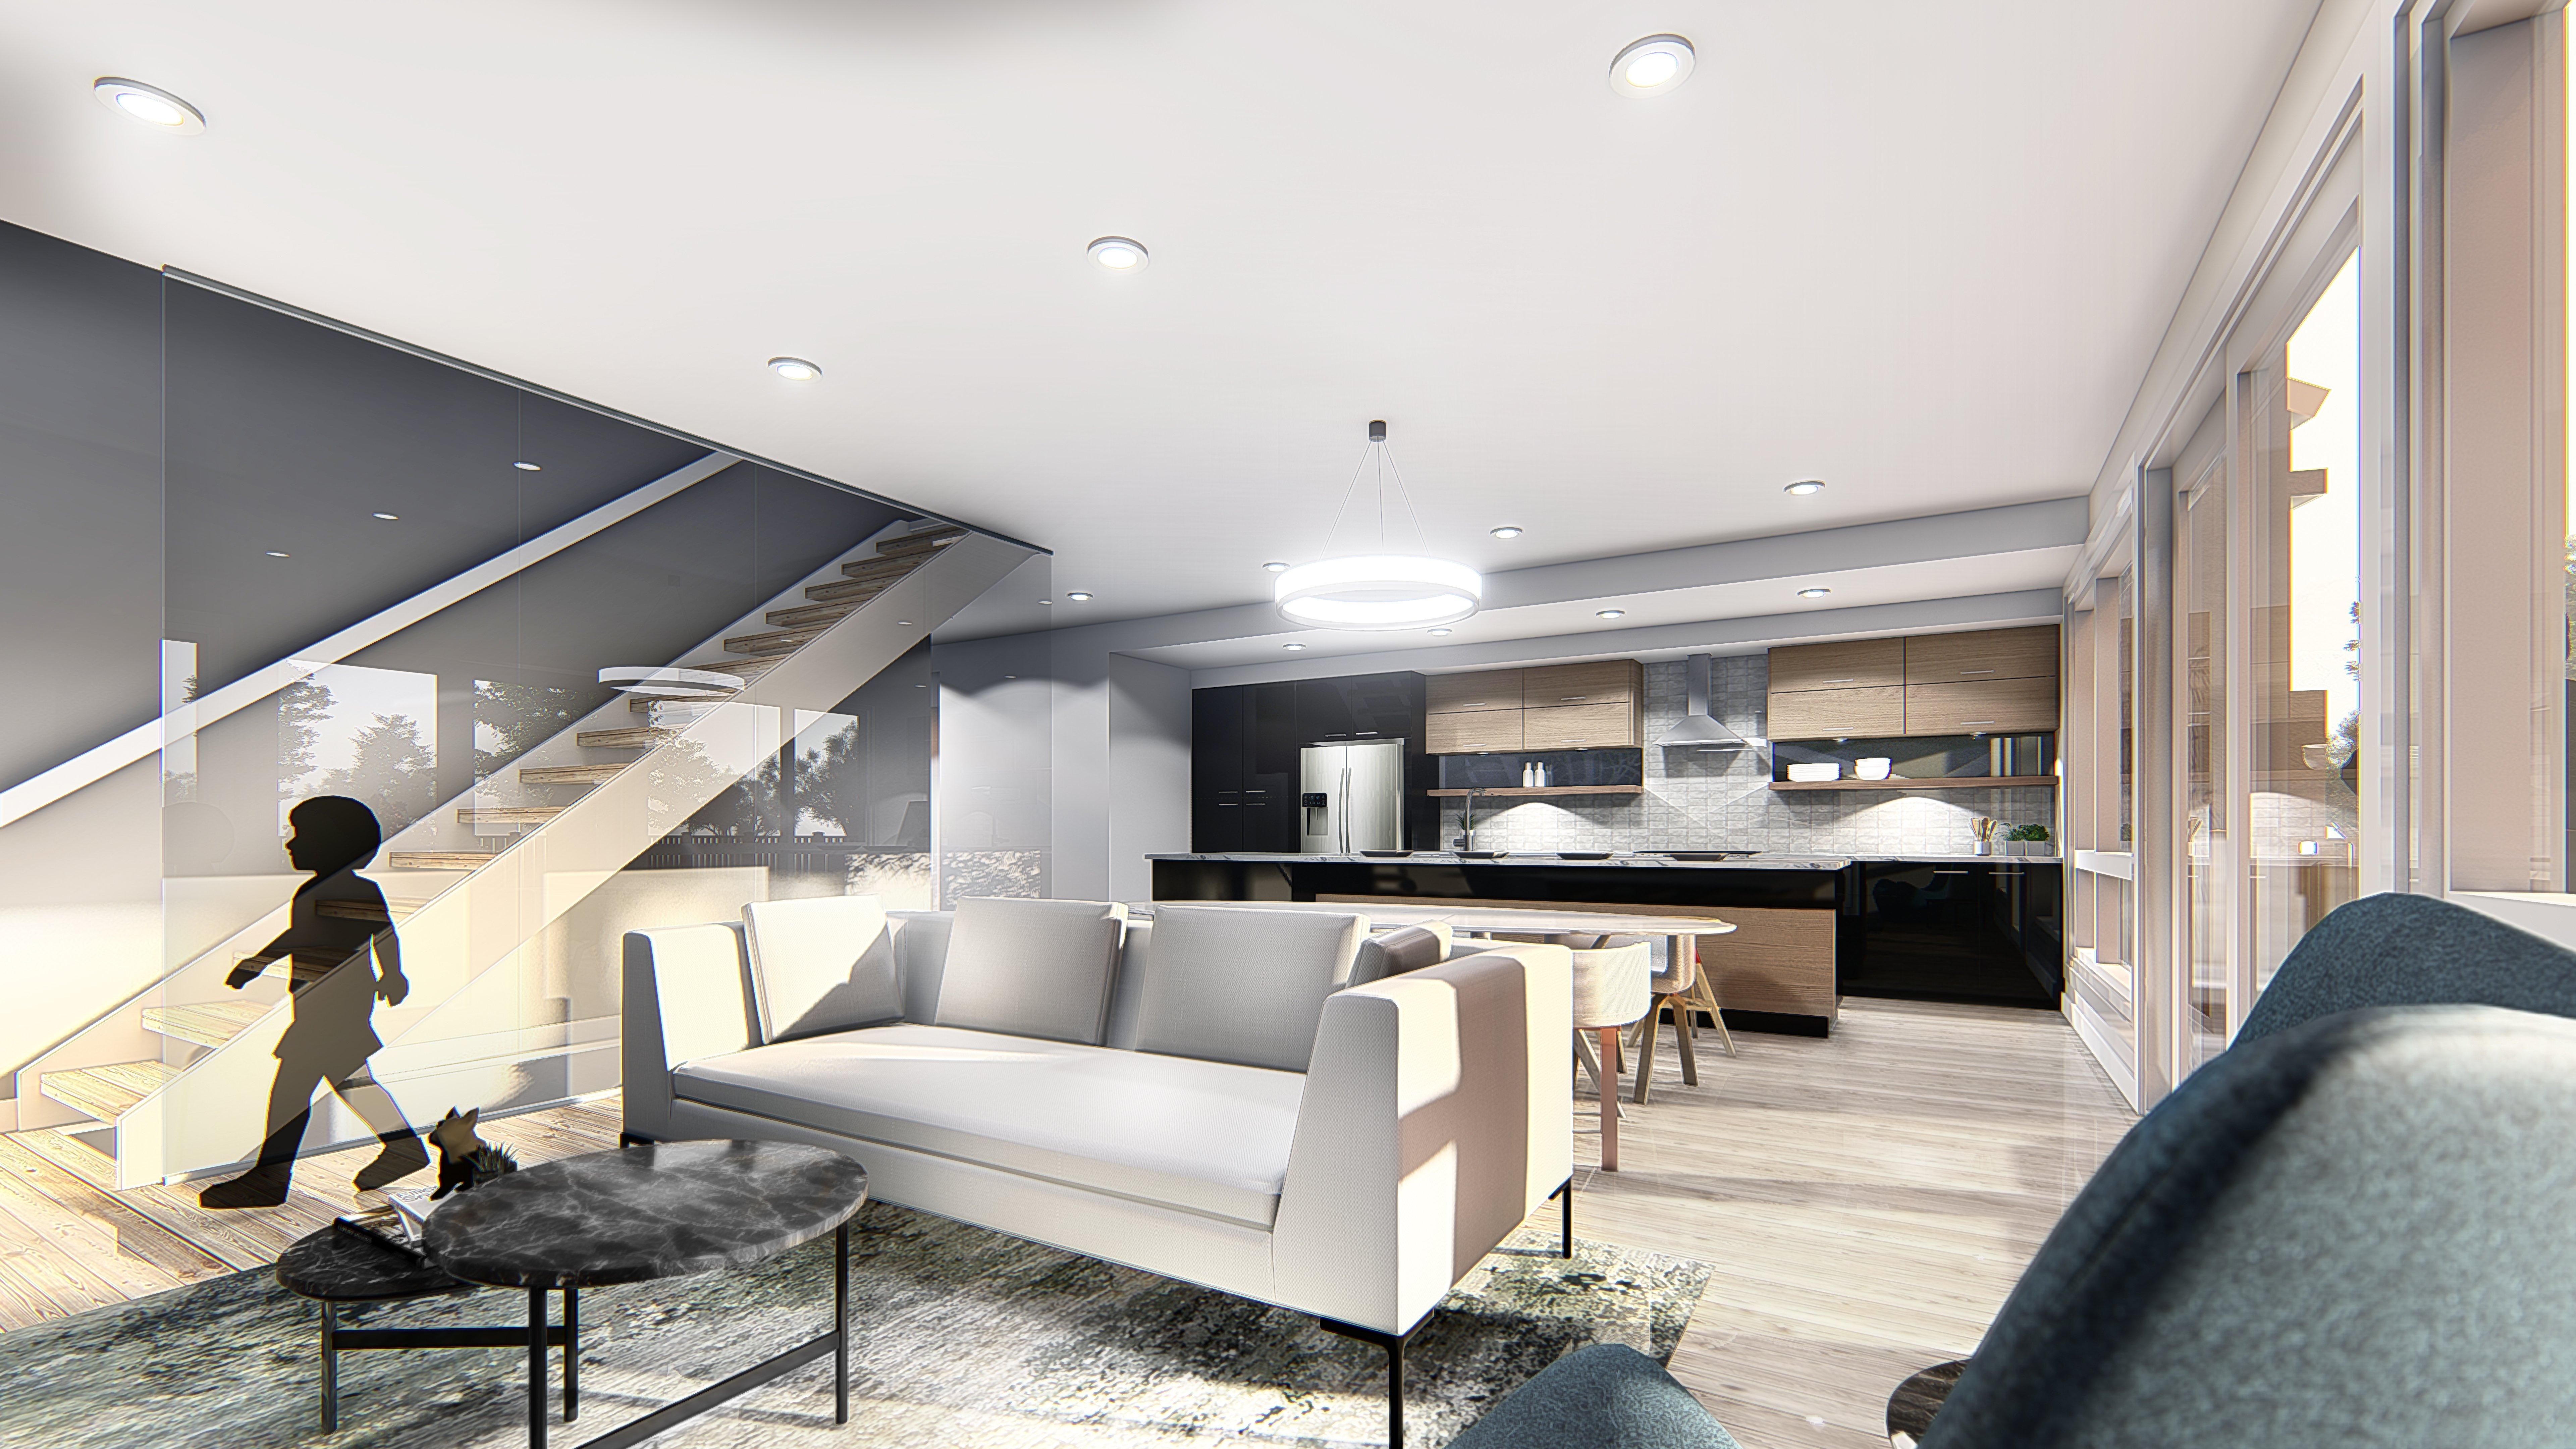 Kanvi homes arbours of keswick evolve model 1